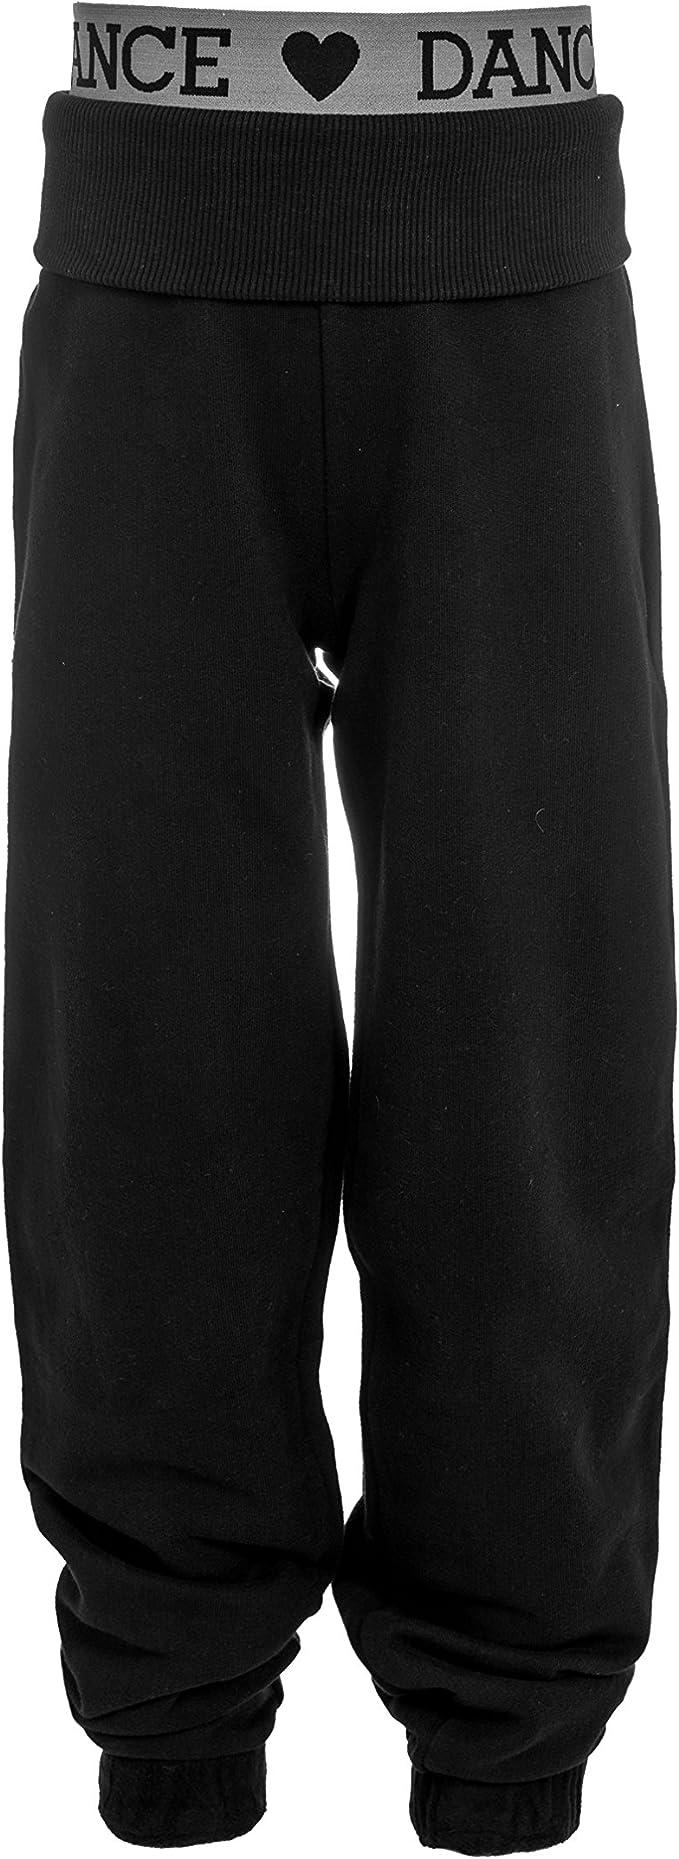 Brody /& Co. Pantaloni Sportivi Ragazza